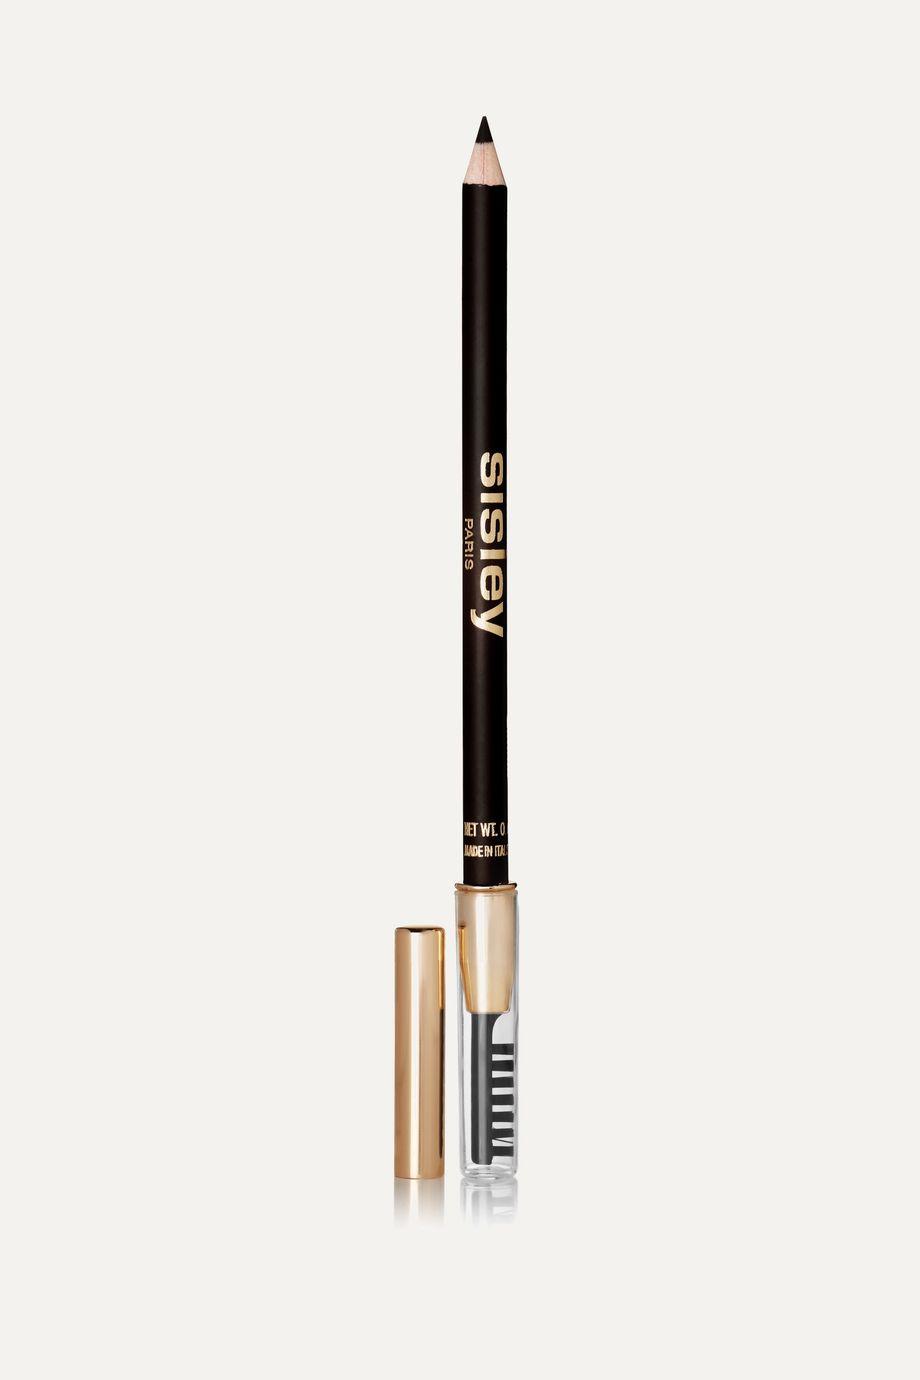 Sisley Phyto-Sourcils Perfect Eyebrow Pencil - 3 Brun